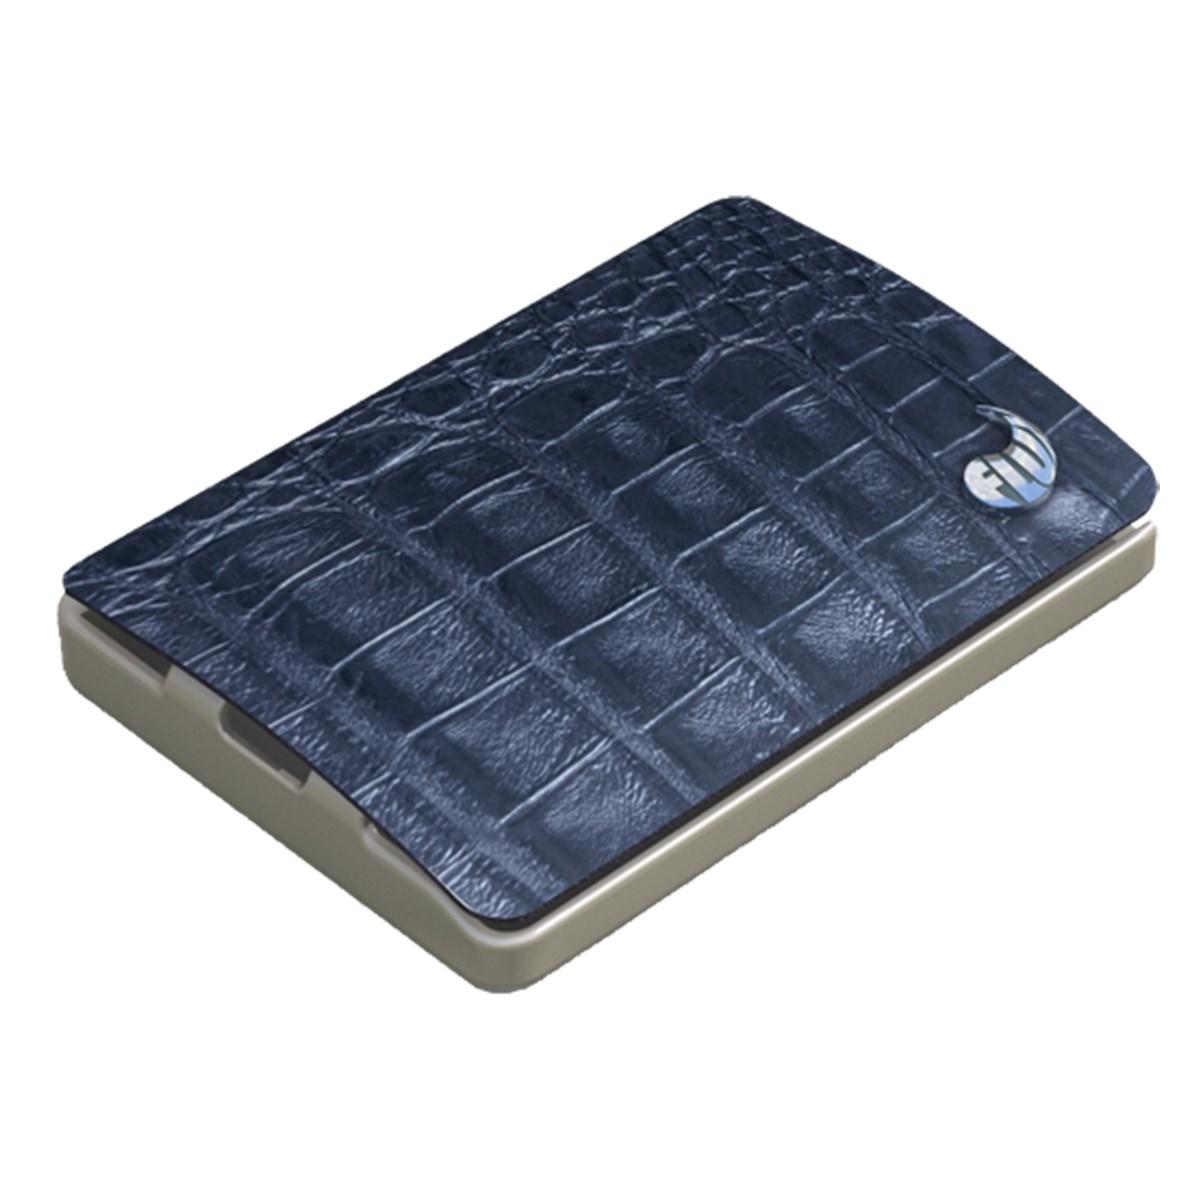 I-CLIP® V Superior Kroko blau Kartenetui, Portemonnaie, I-CLIP® V S-rior Kroko, Portemonnaie, Bl